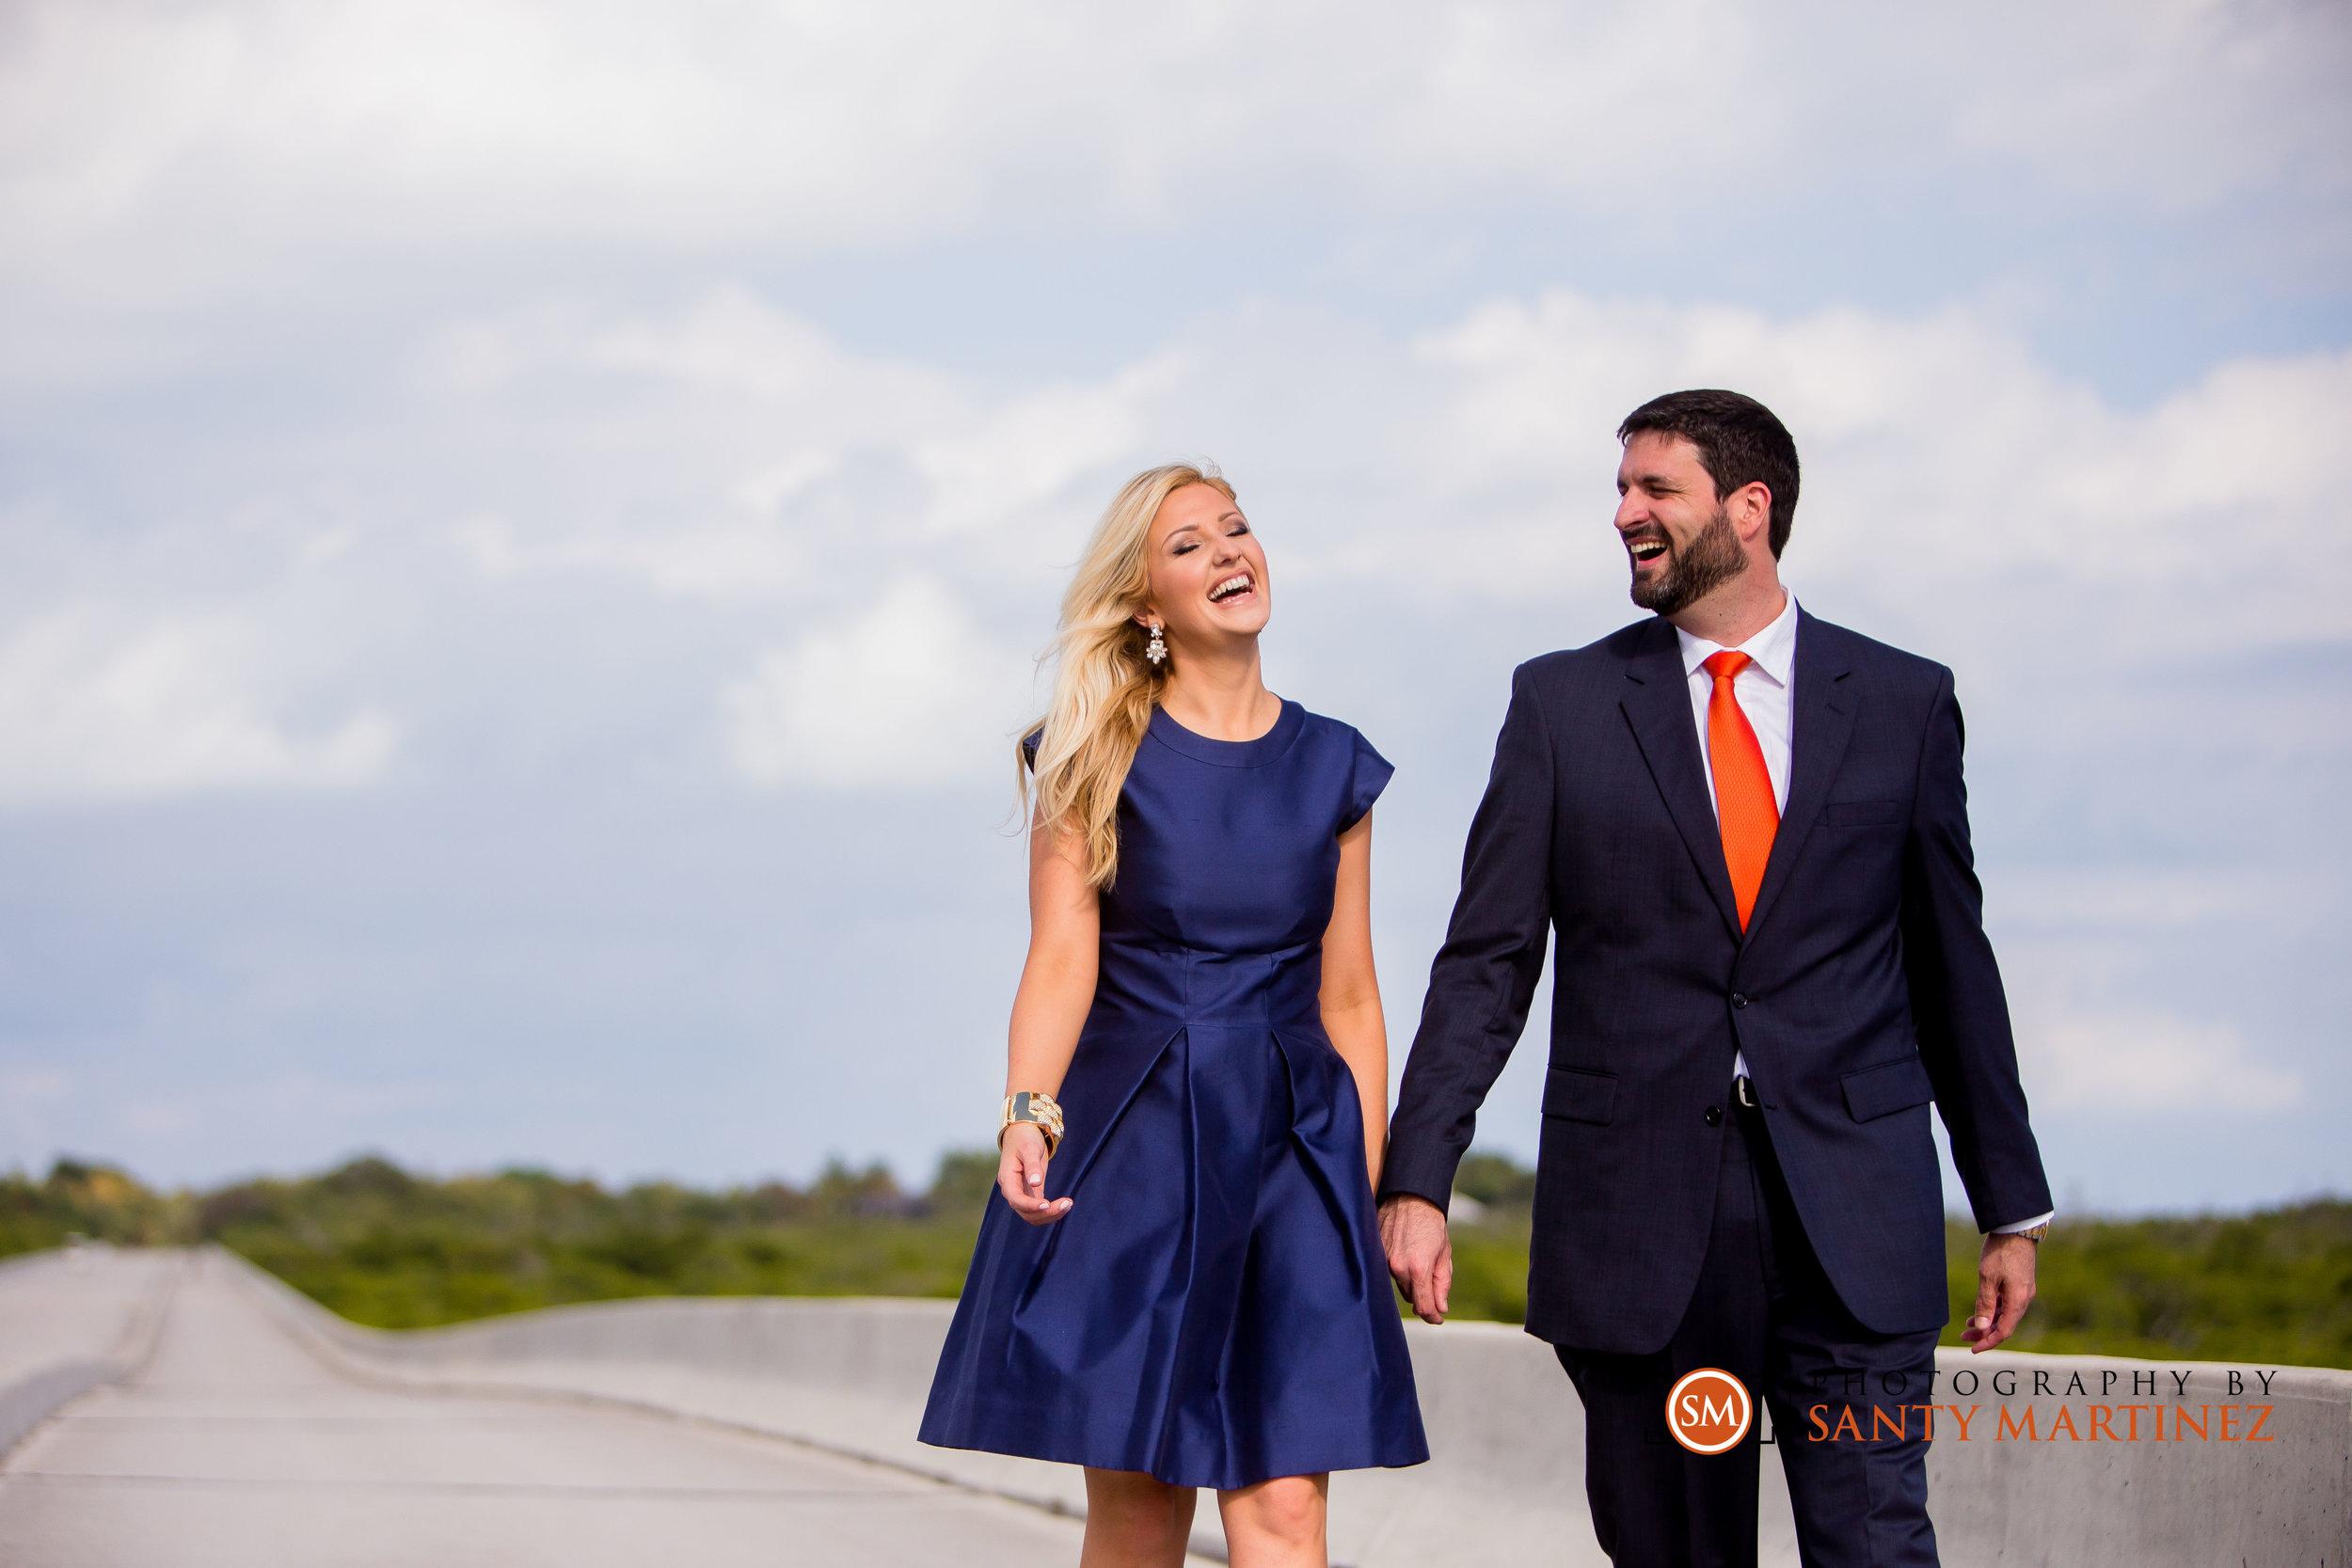 Photography by Santy Martinez - Miami Wedding Photographer-7.jpg